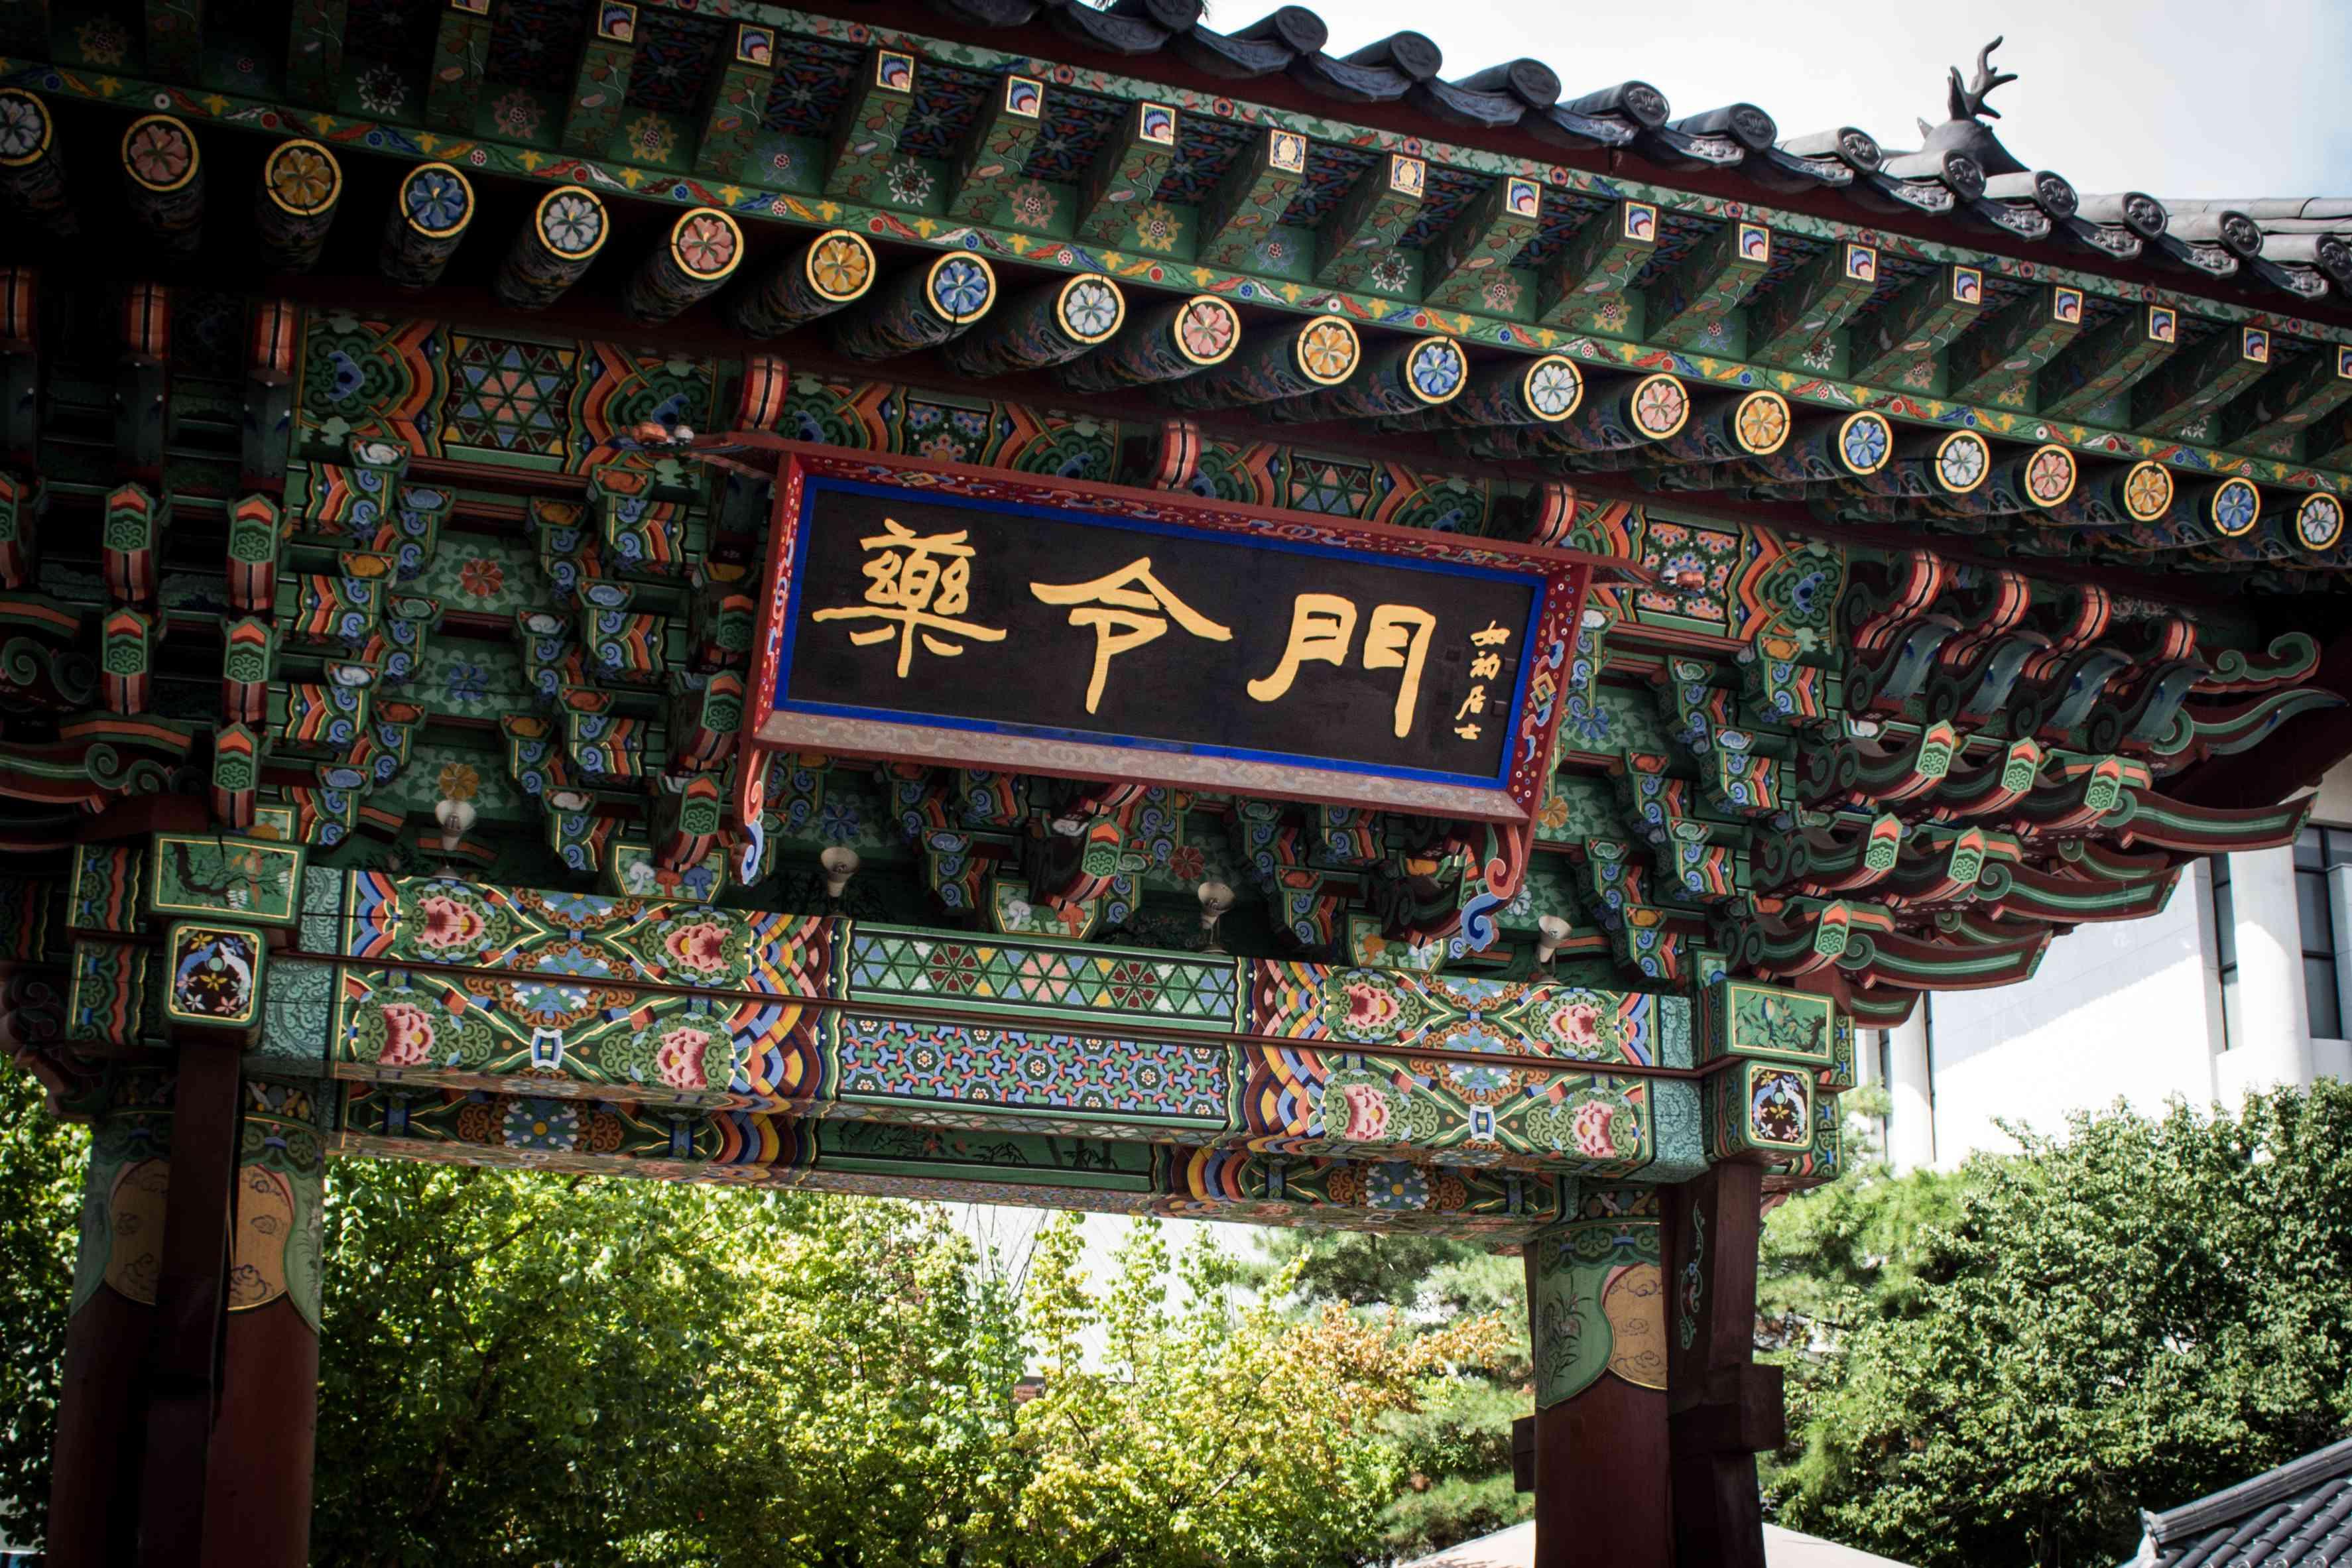 The gate monument at Yangnyeongsi, Daegu, South Korea